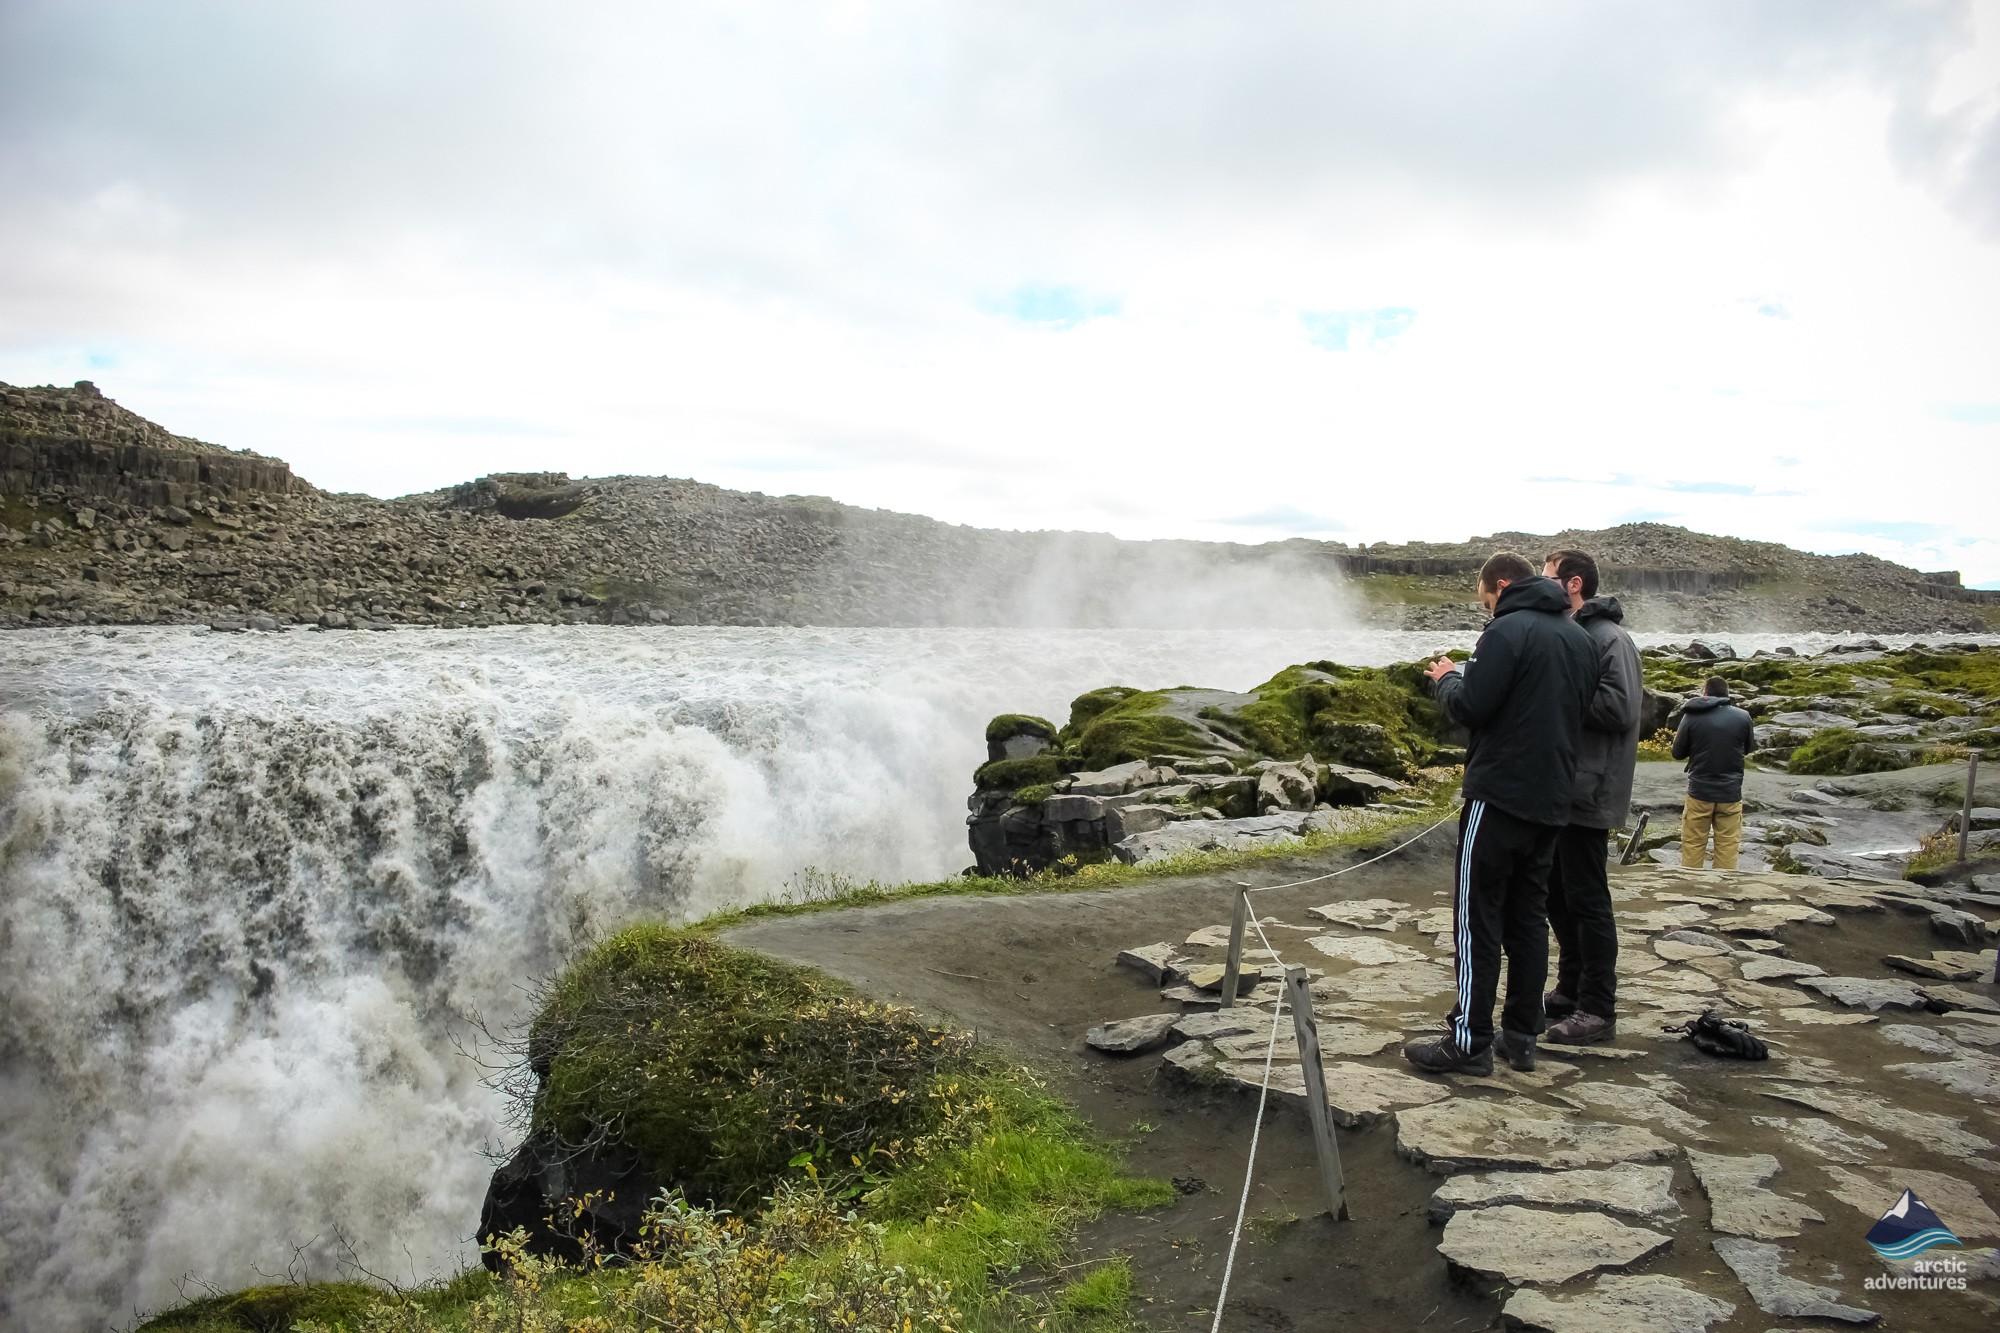 Hiking to Dettifoss waterfall